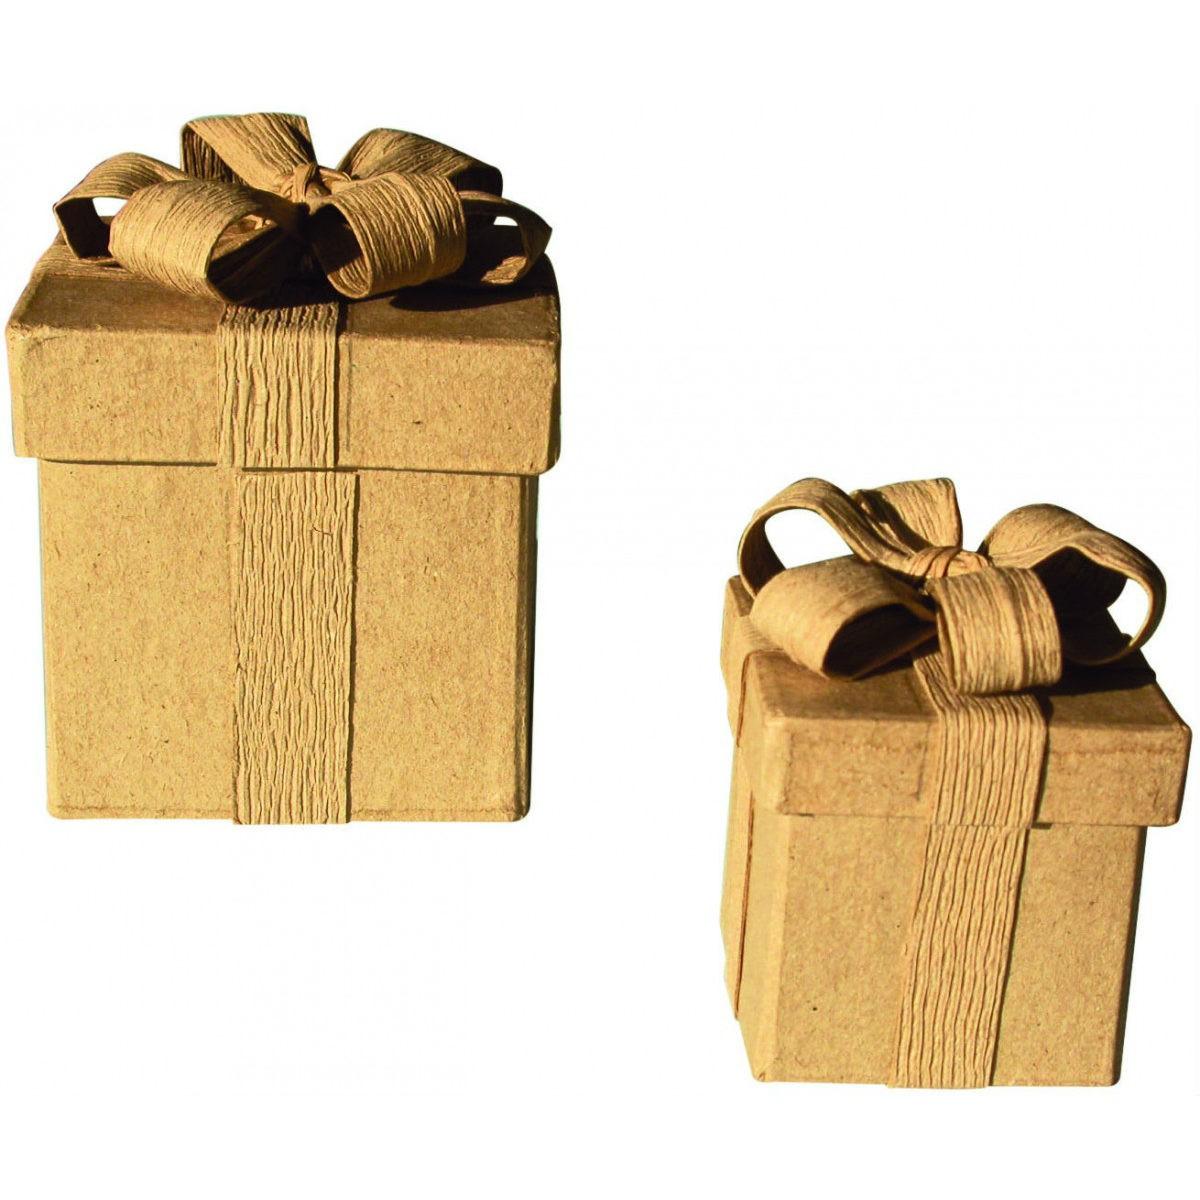 pappschachtel mit deckel schleife geschenk box 5x5xh6 6cm. Black Bedroom Furniture Sets. Home Design Ideas